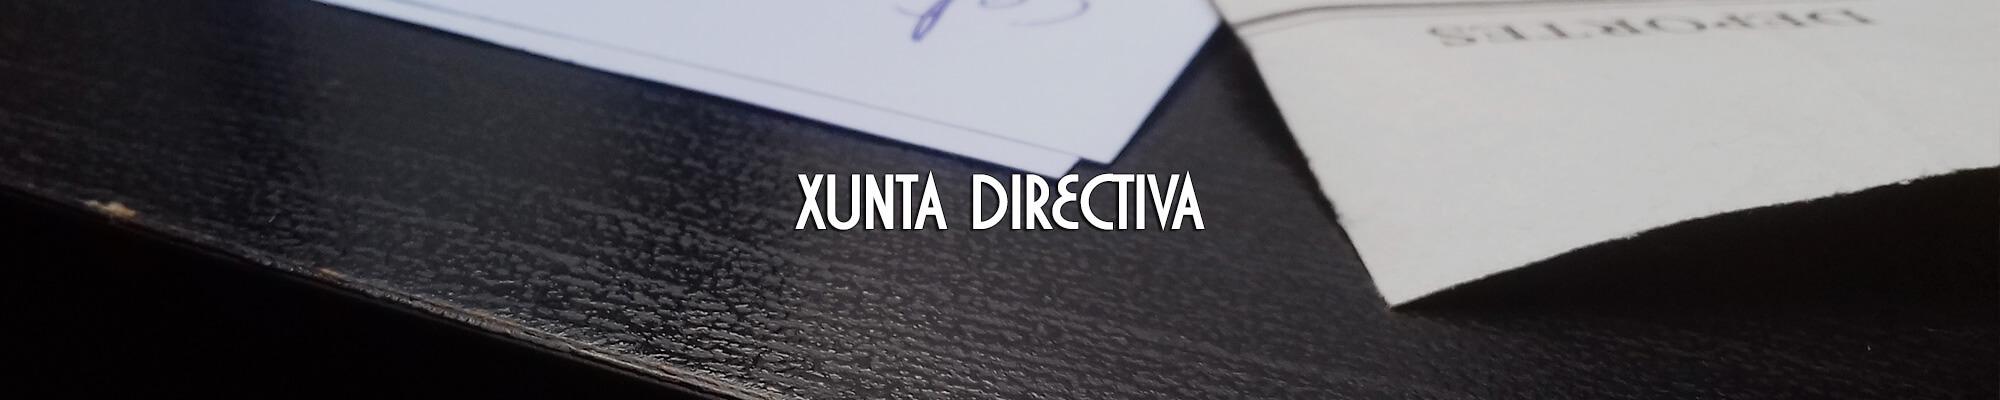 xunta directiva